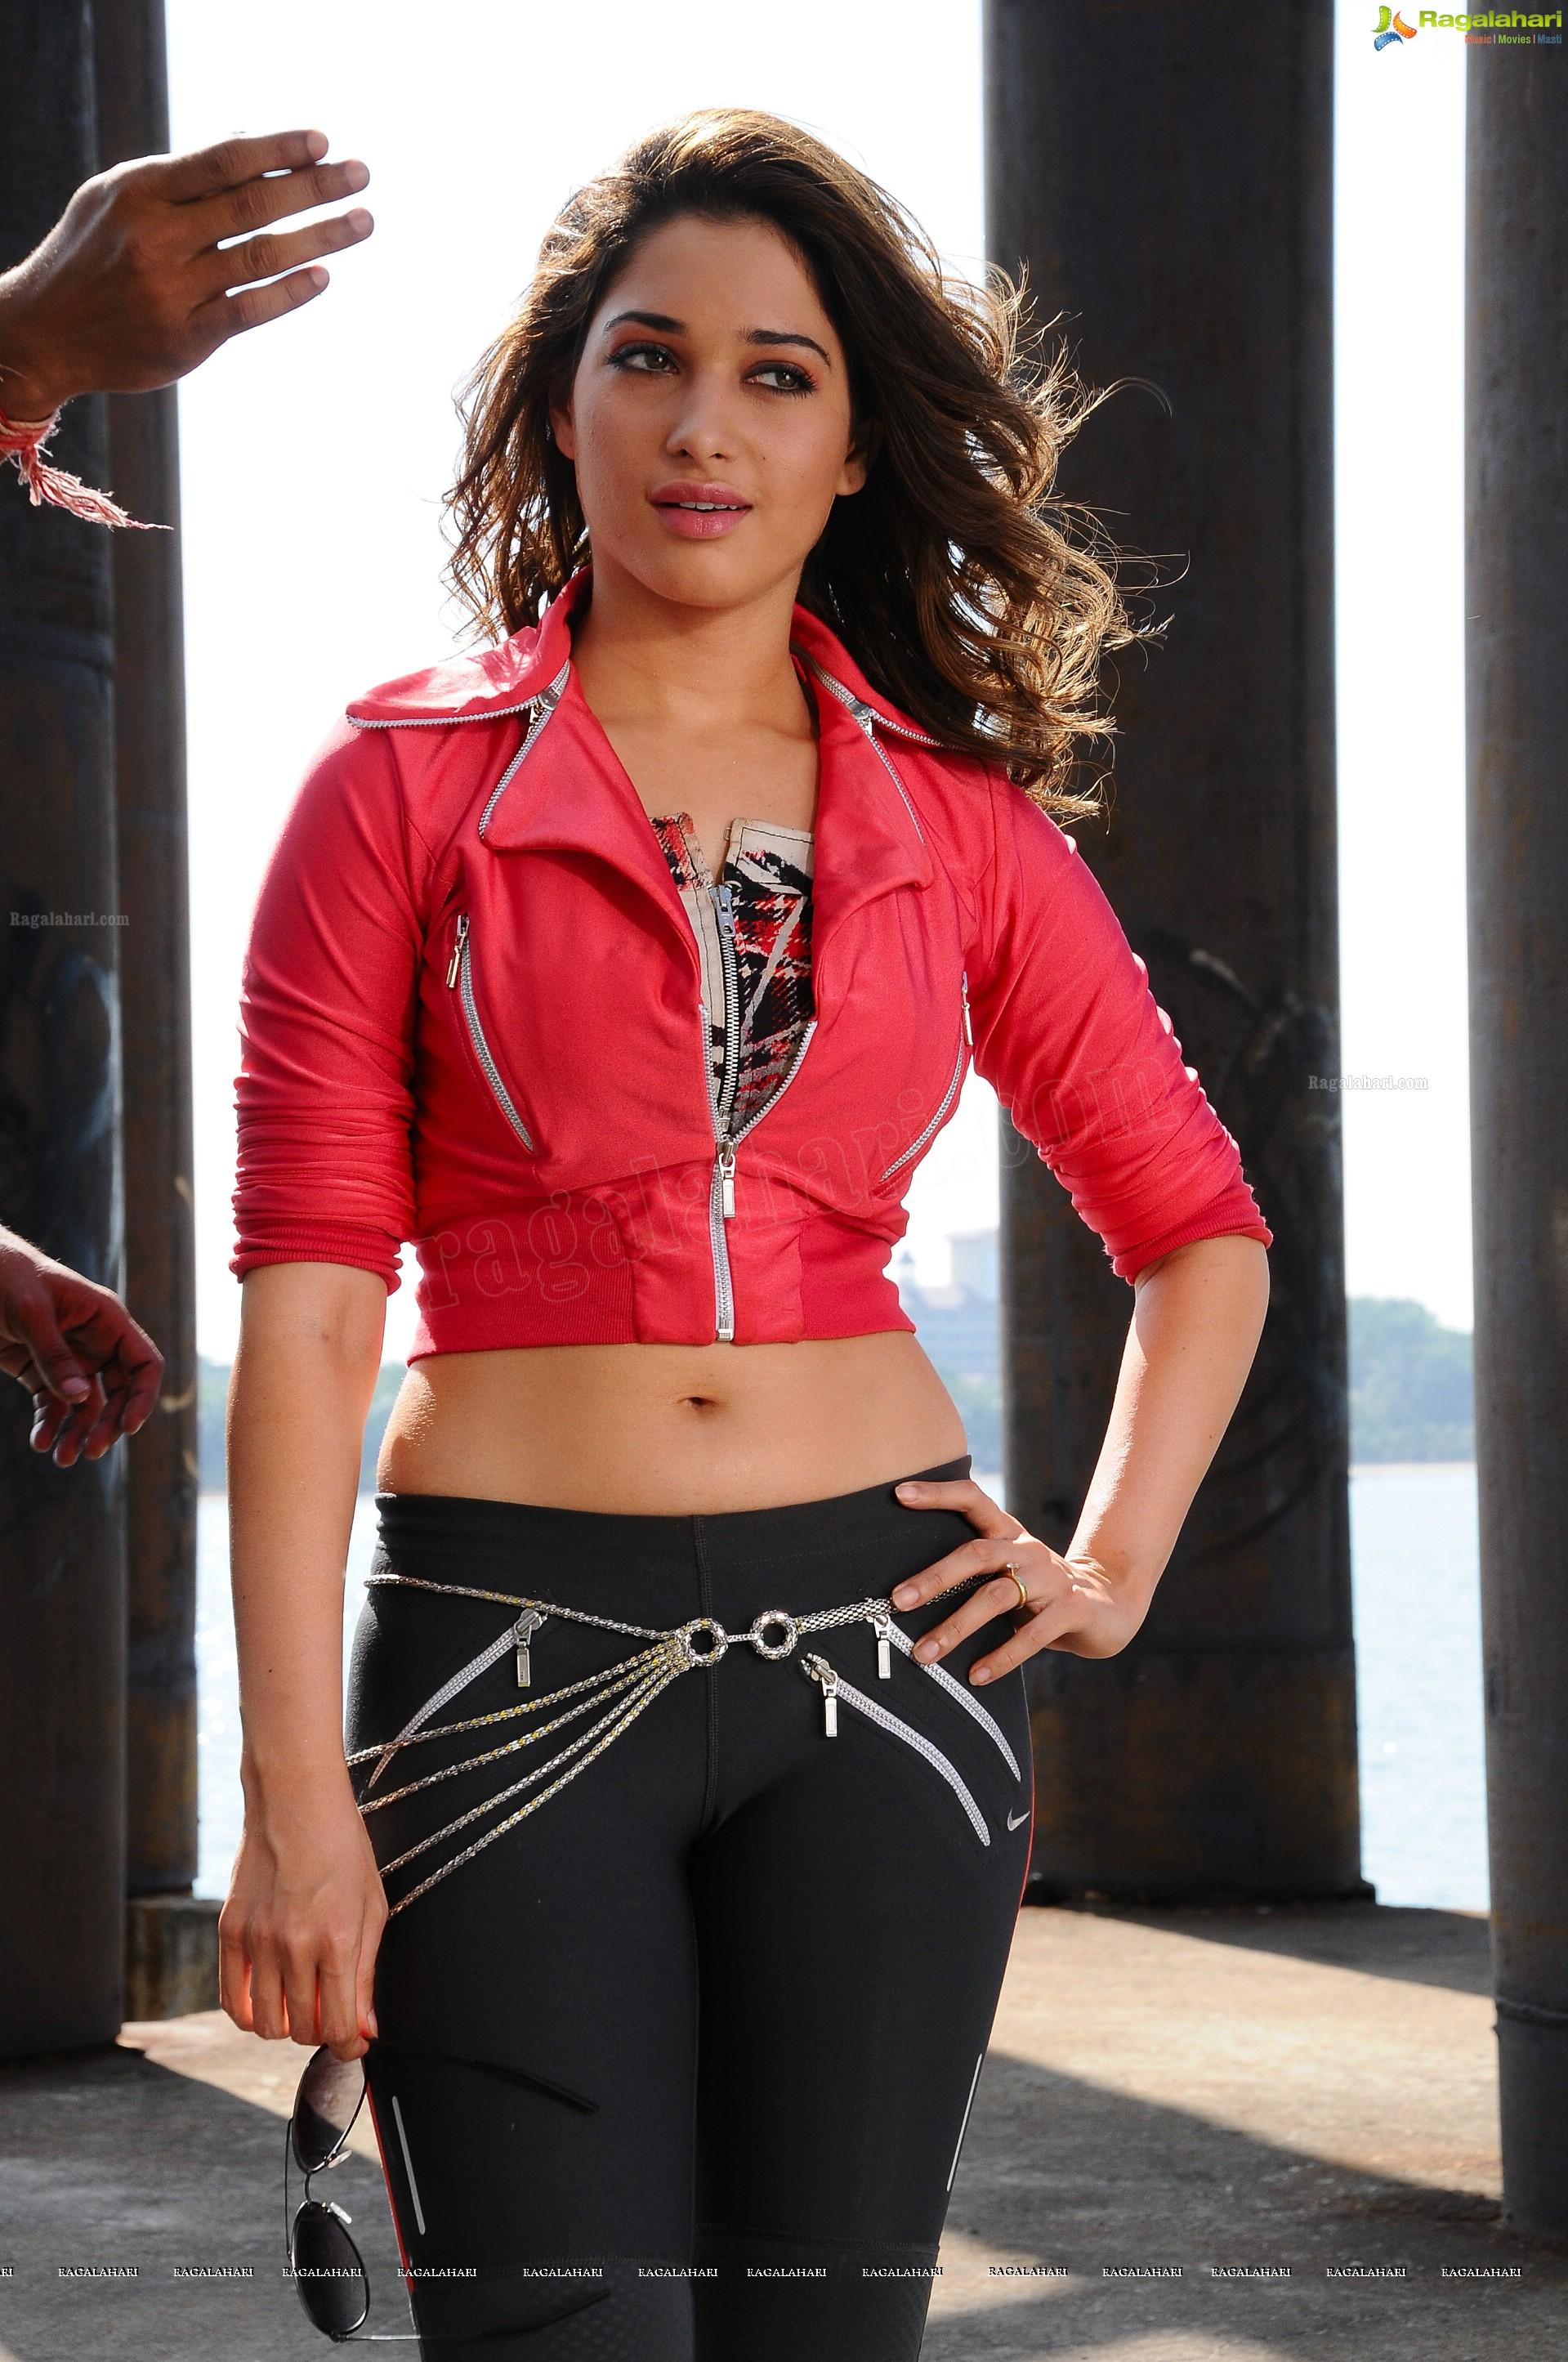 tamanna (high definition) image 20 | telugu actress images,images